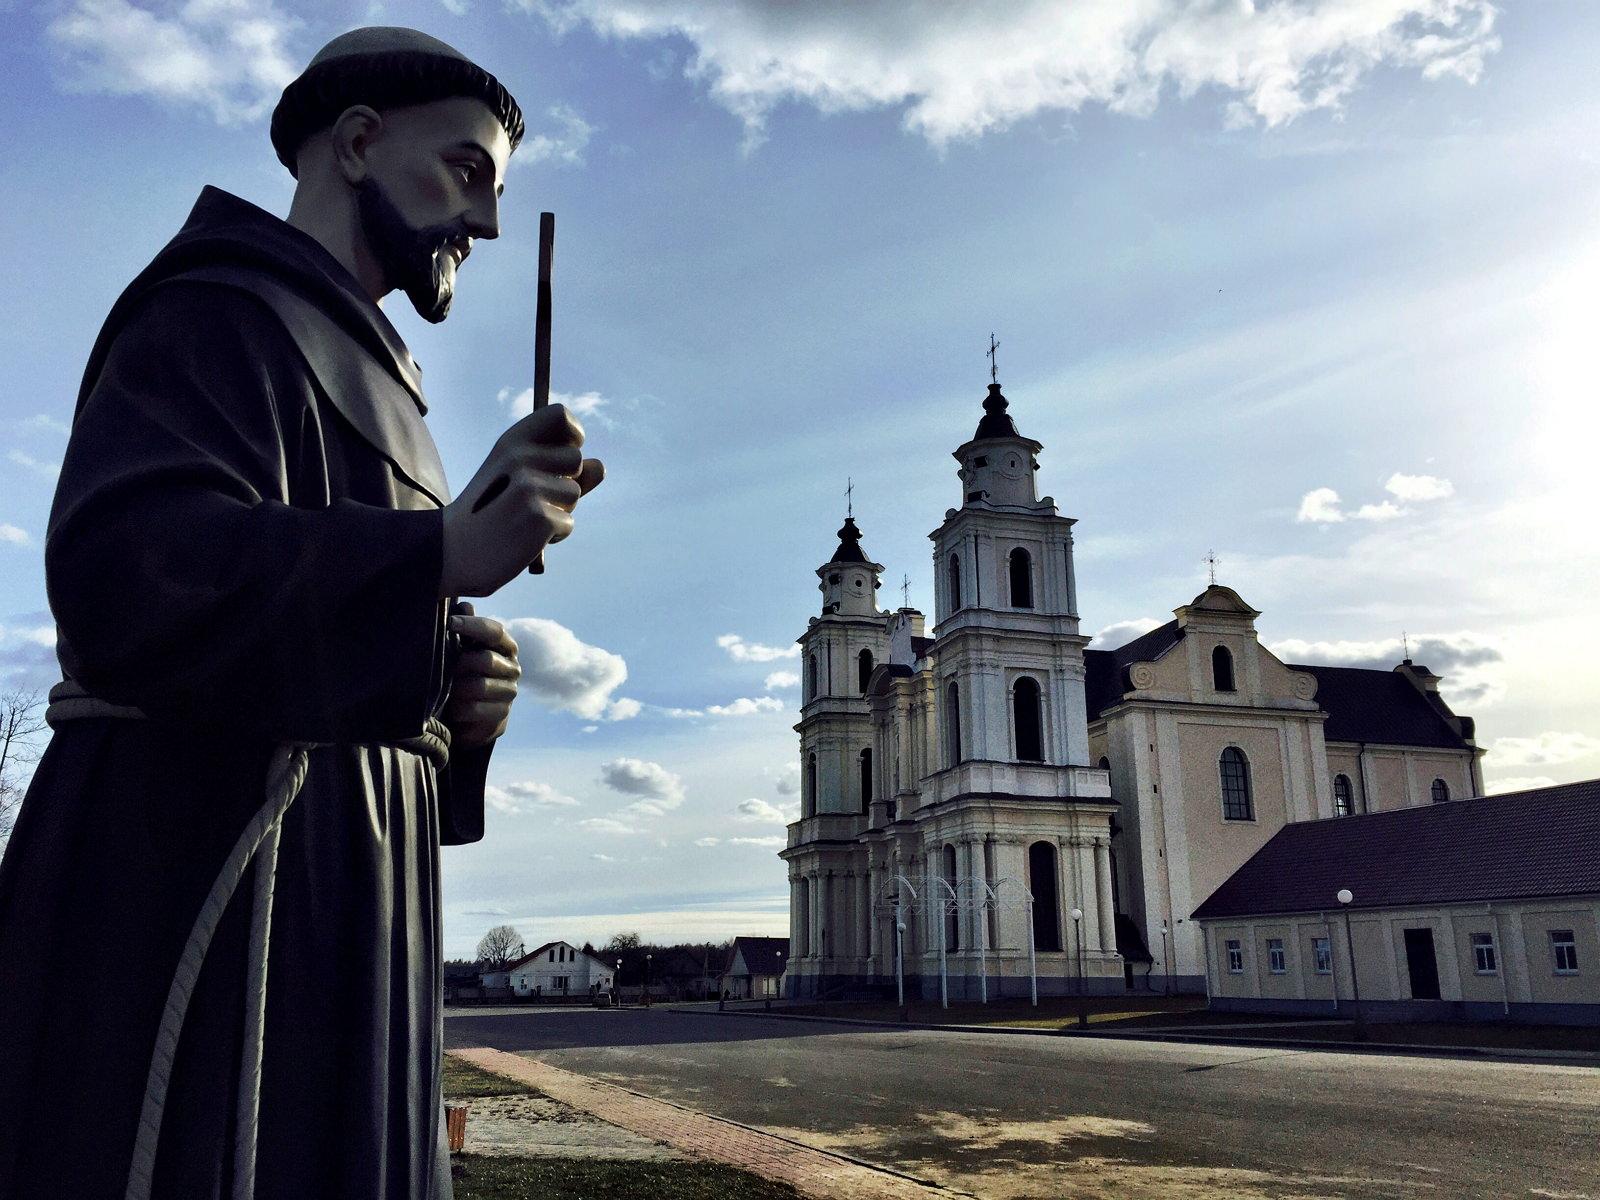 Church of the Bernardines in Budslau Belarus